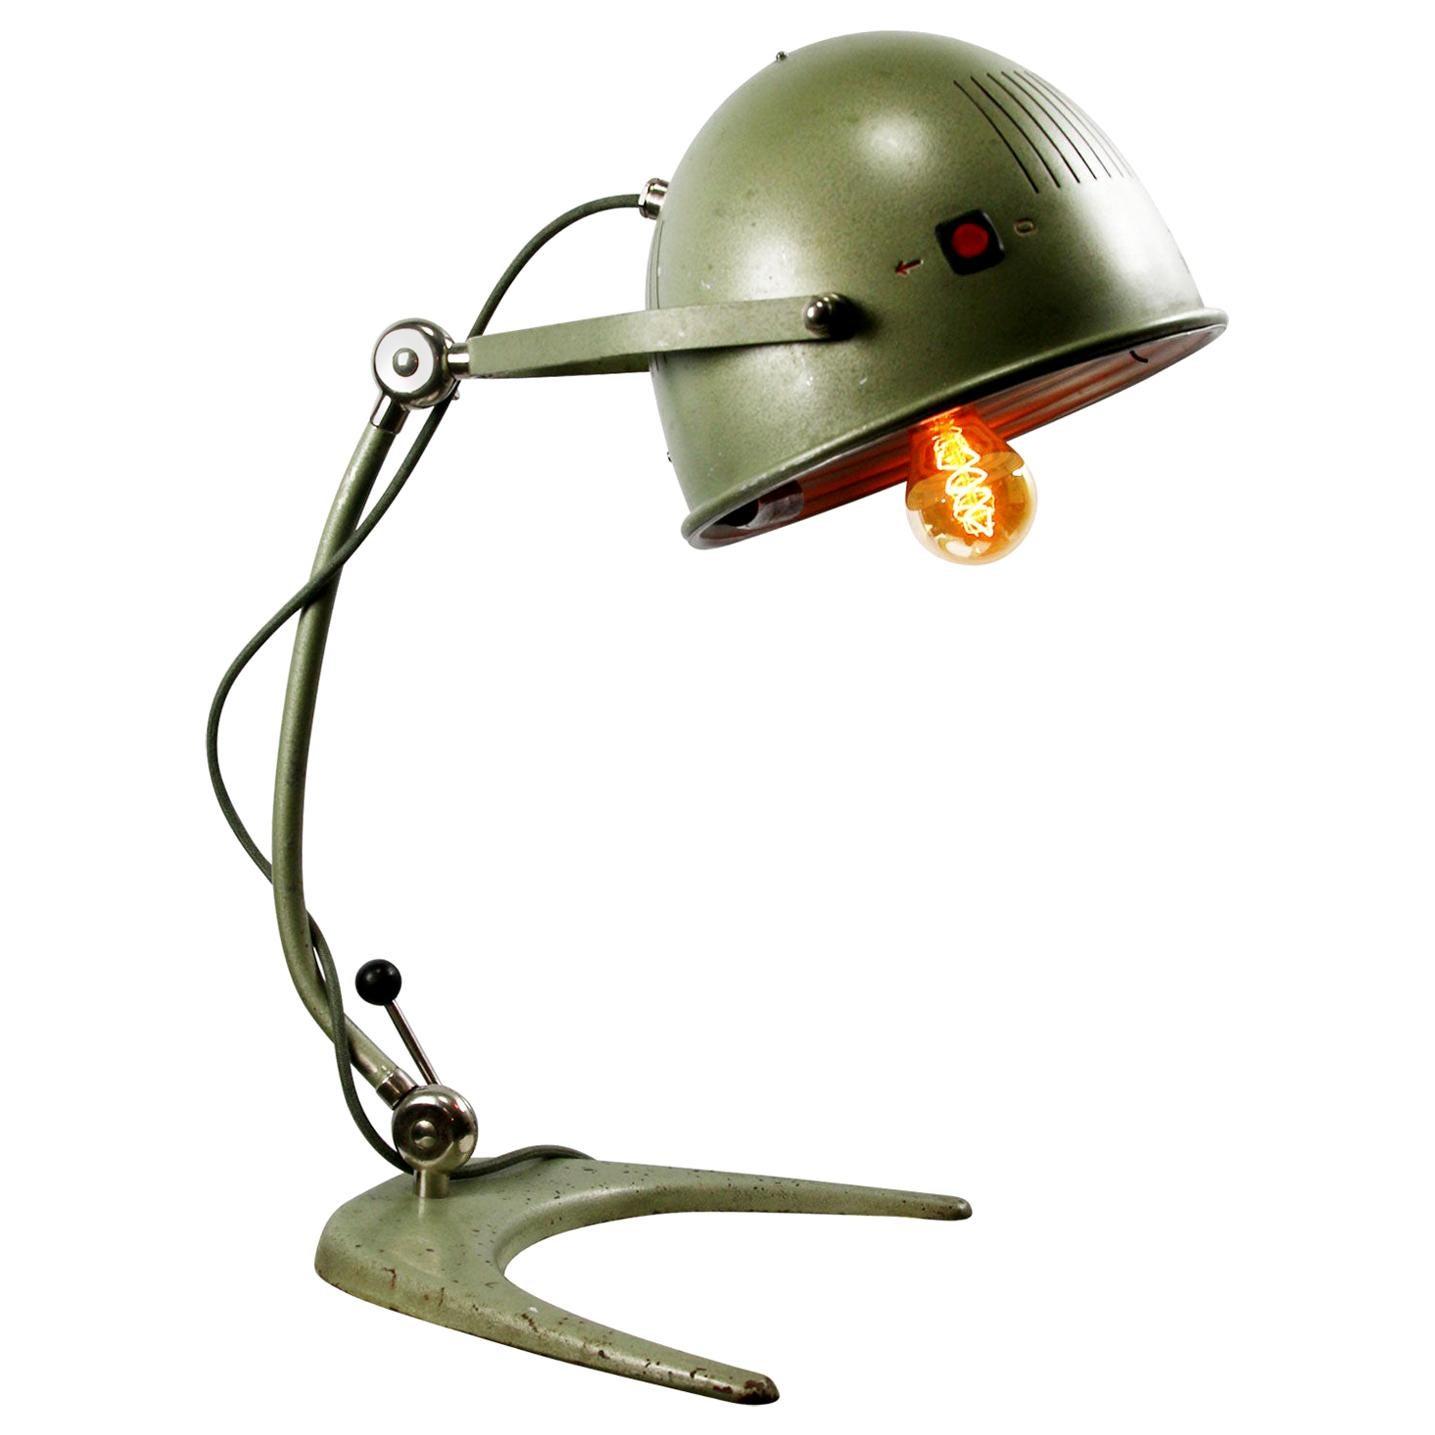 Green Metal Vintage Industrial Medical Desk Table Lamp